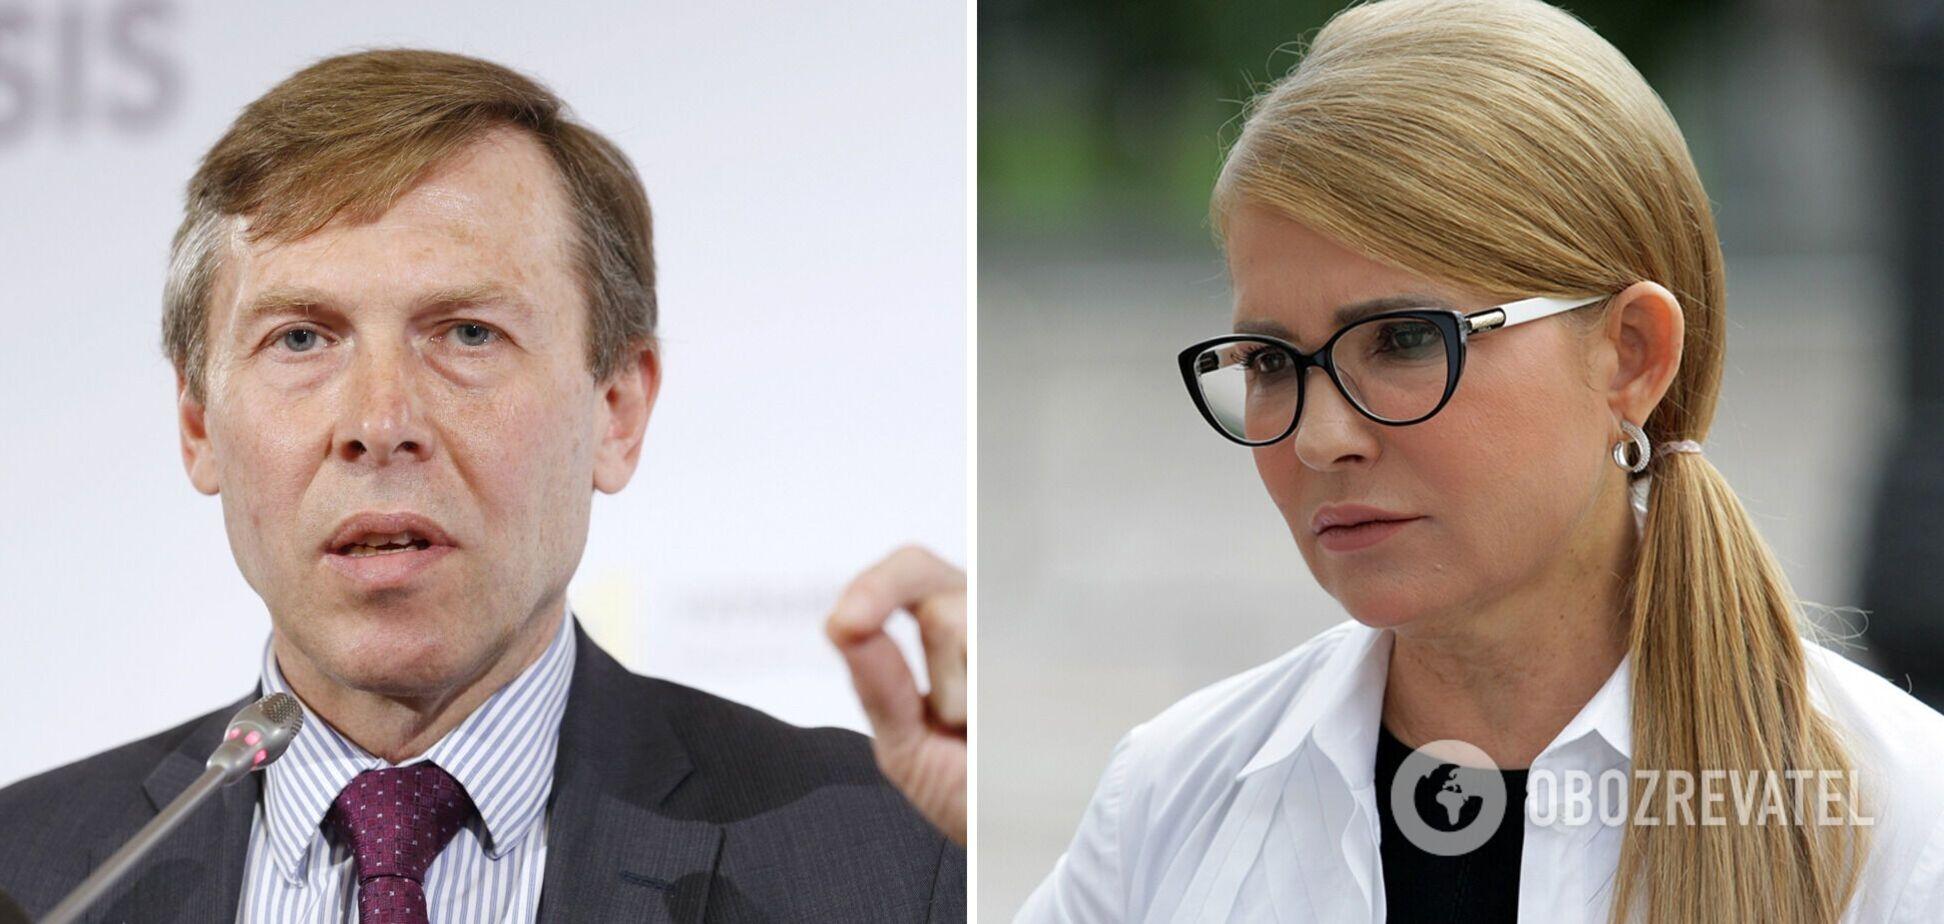 Соболев соврал о незаконности приговора Тимошенко по газовому делу